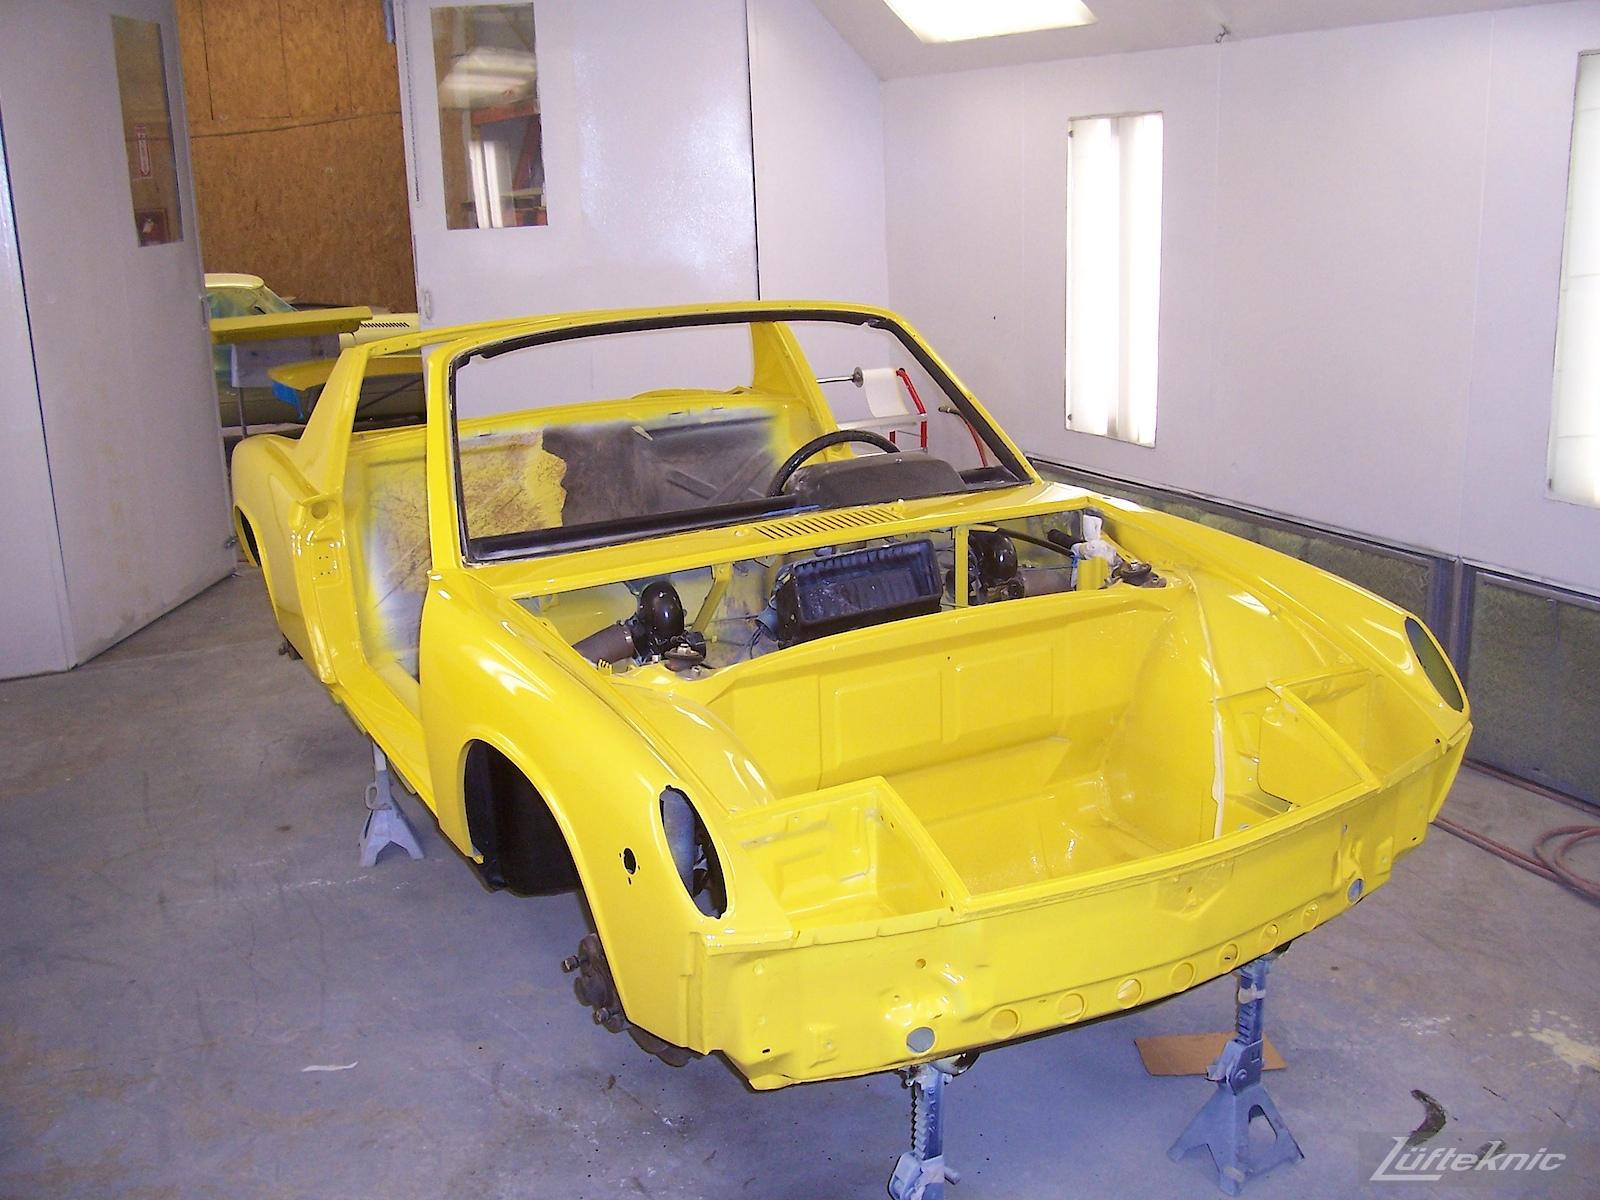 Fresh yellow paint on a Porsche 914 being restored.